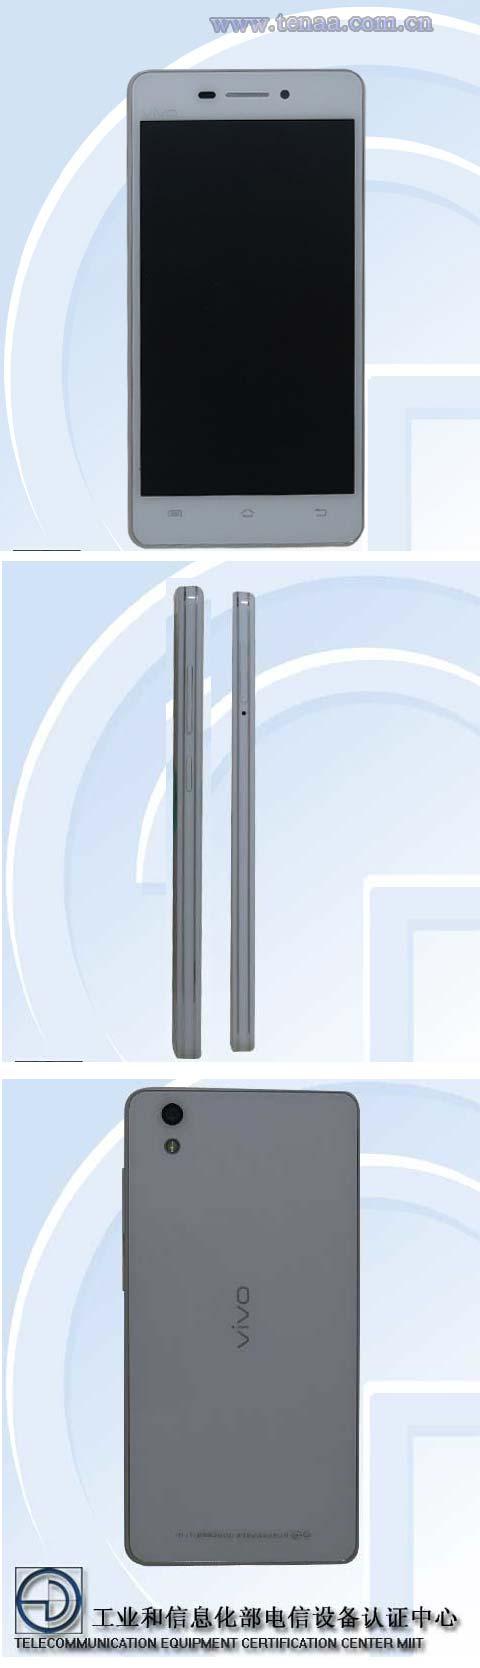 Vivo Y929   смартфон в корпусе из защитного стекла и металла